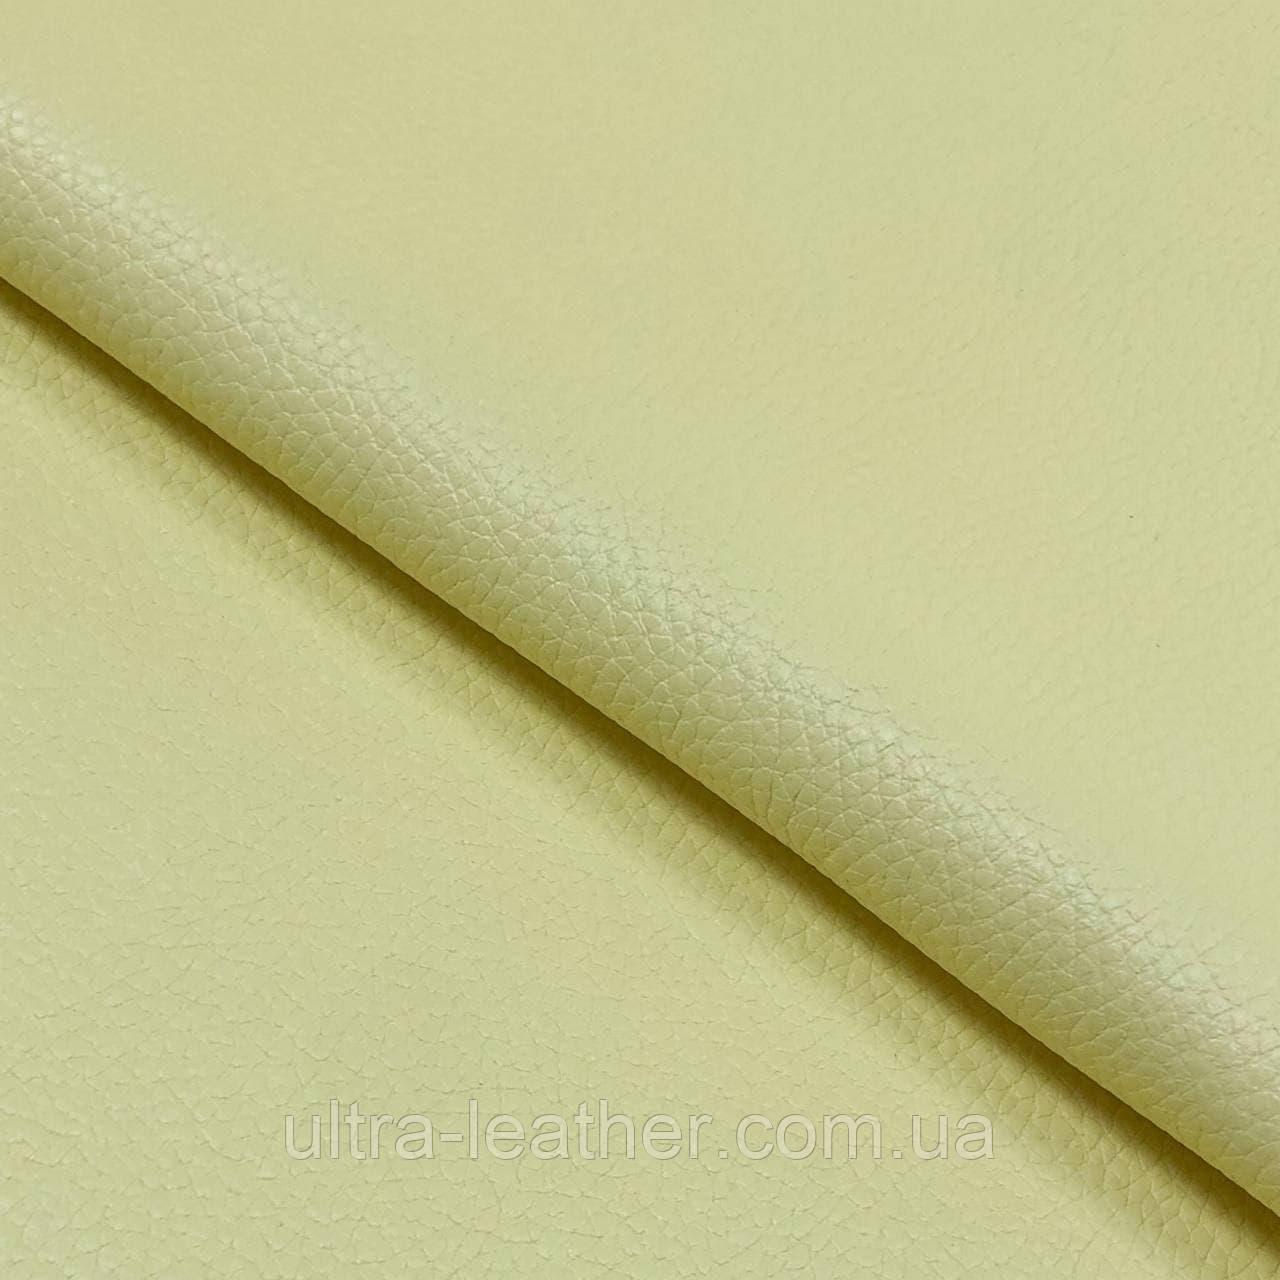 Натуральная галантерейная кожа  ФЛЕШ, Желтый, Pantone 12-0824